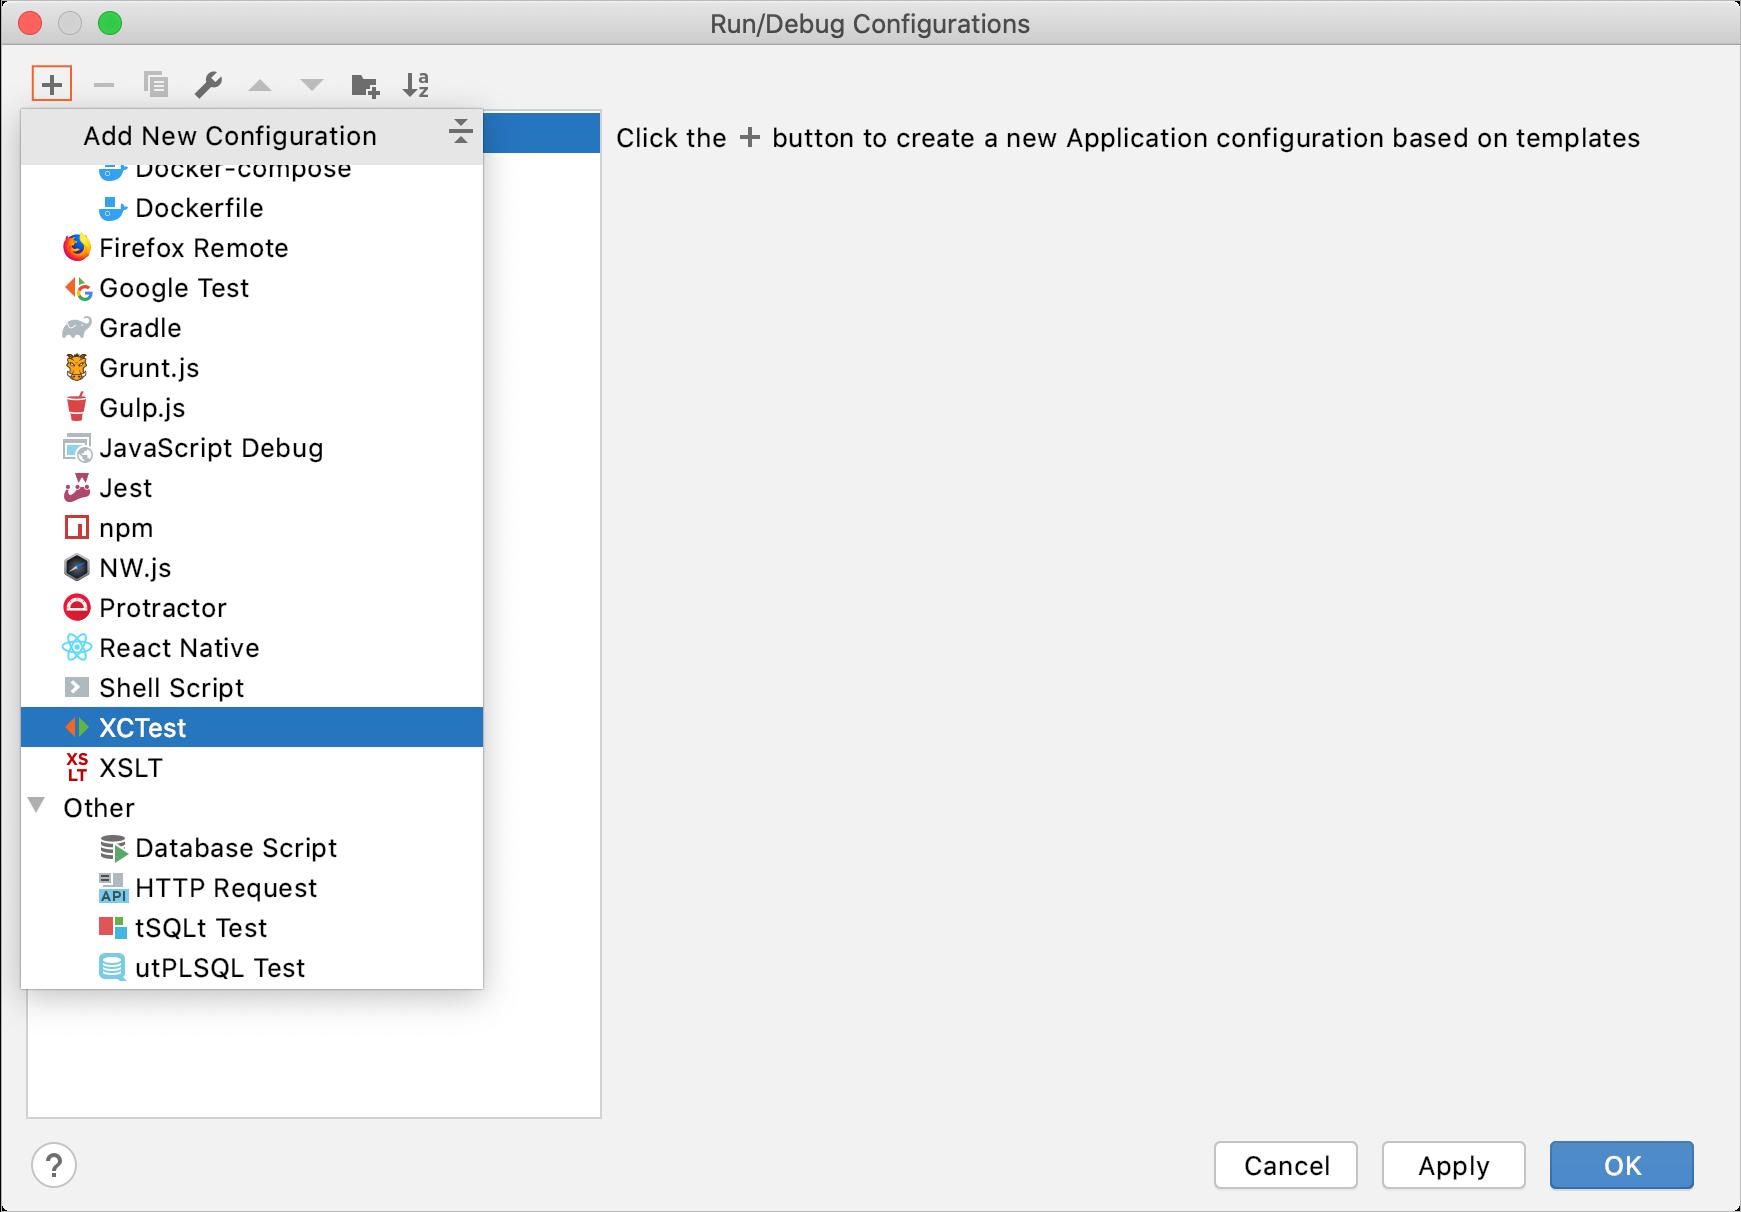 Add a new XCTest configuration